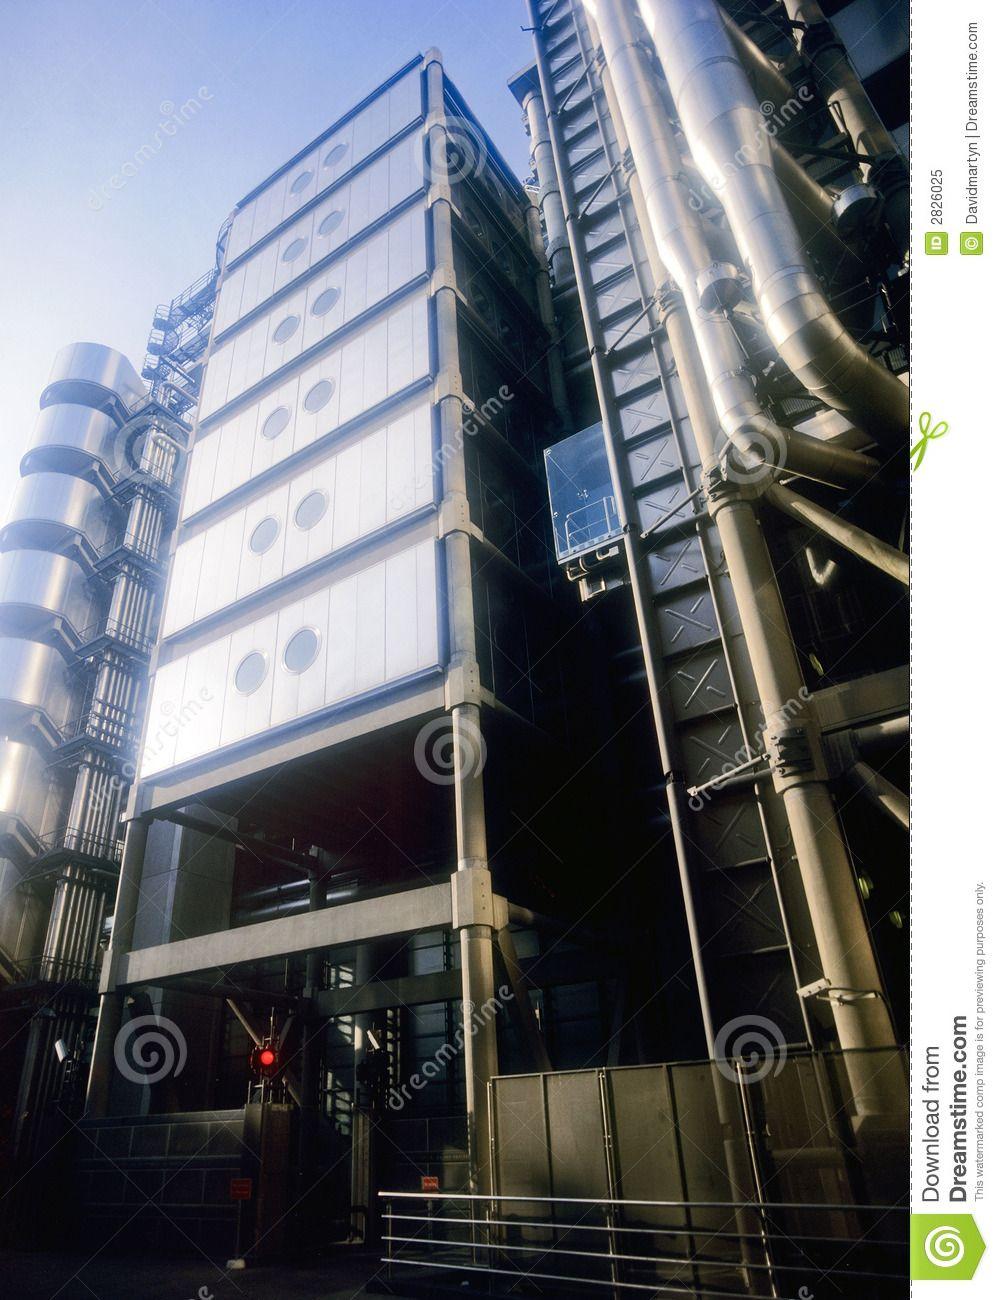 | Lloyds of London | Lloyds of London insurance company building London England UK Europe.